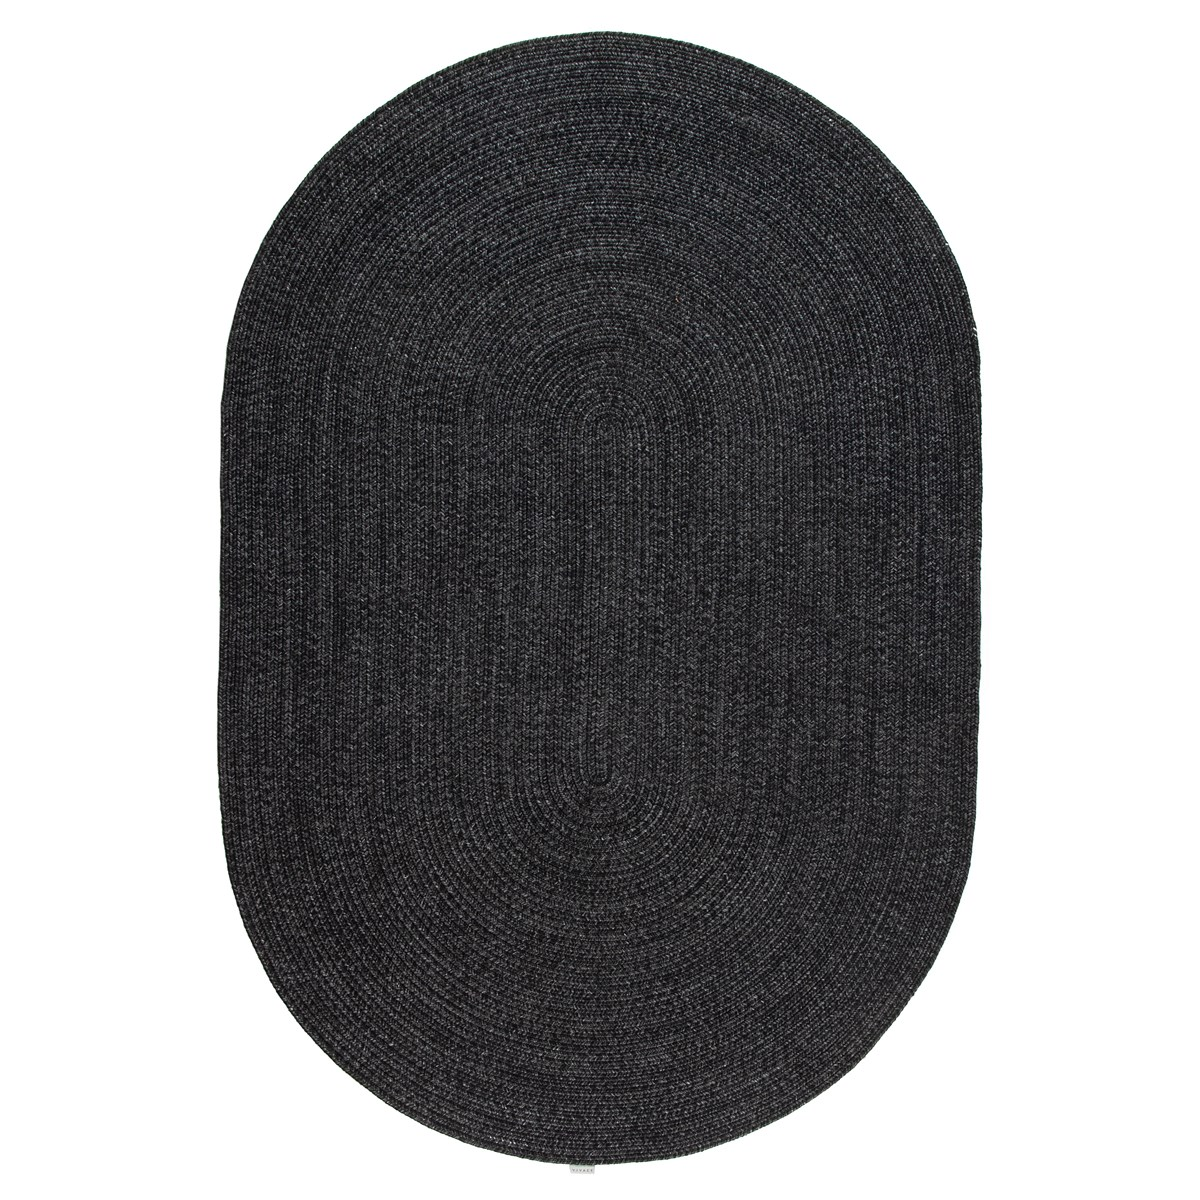 Tapis de salon en Polypropylène Gris anthracite 160x230 cm